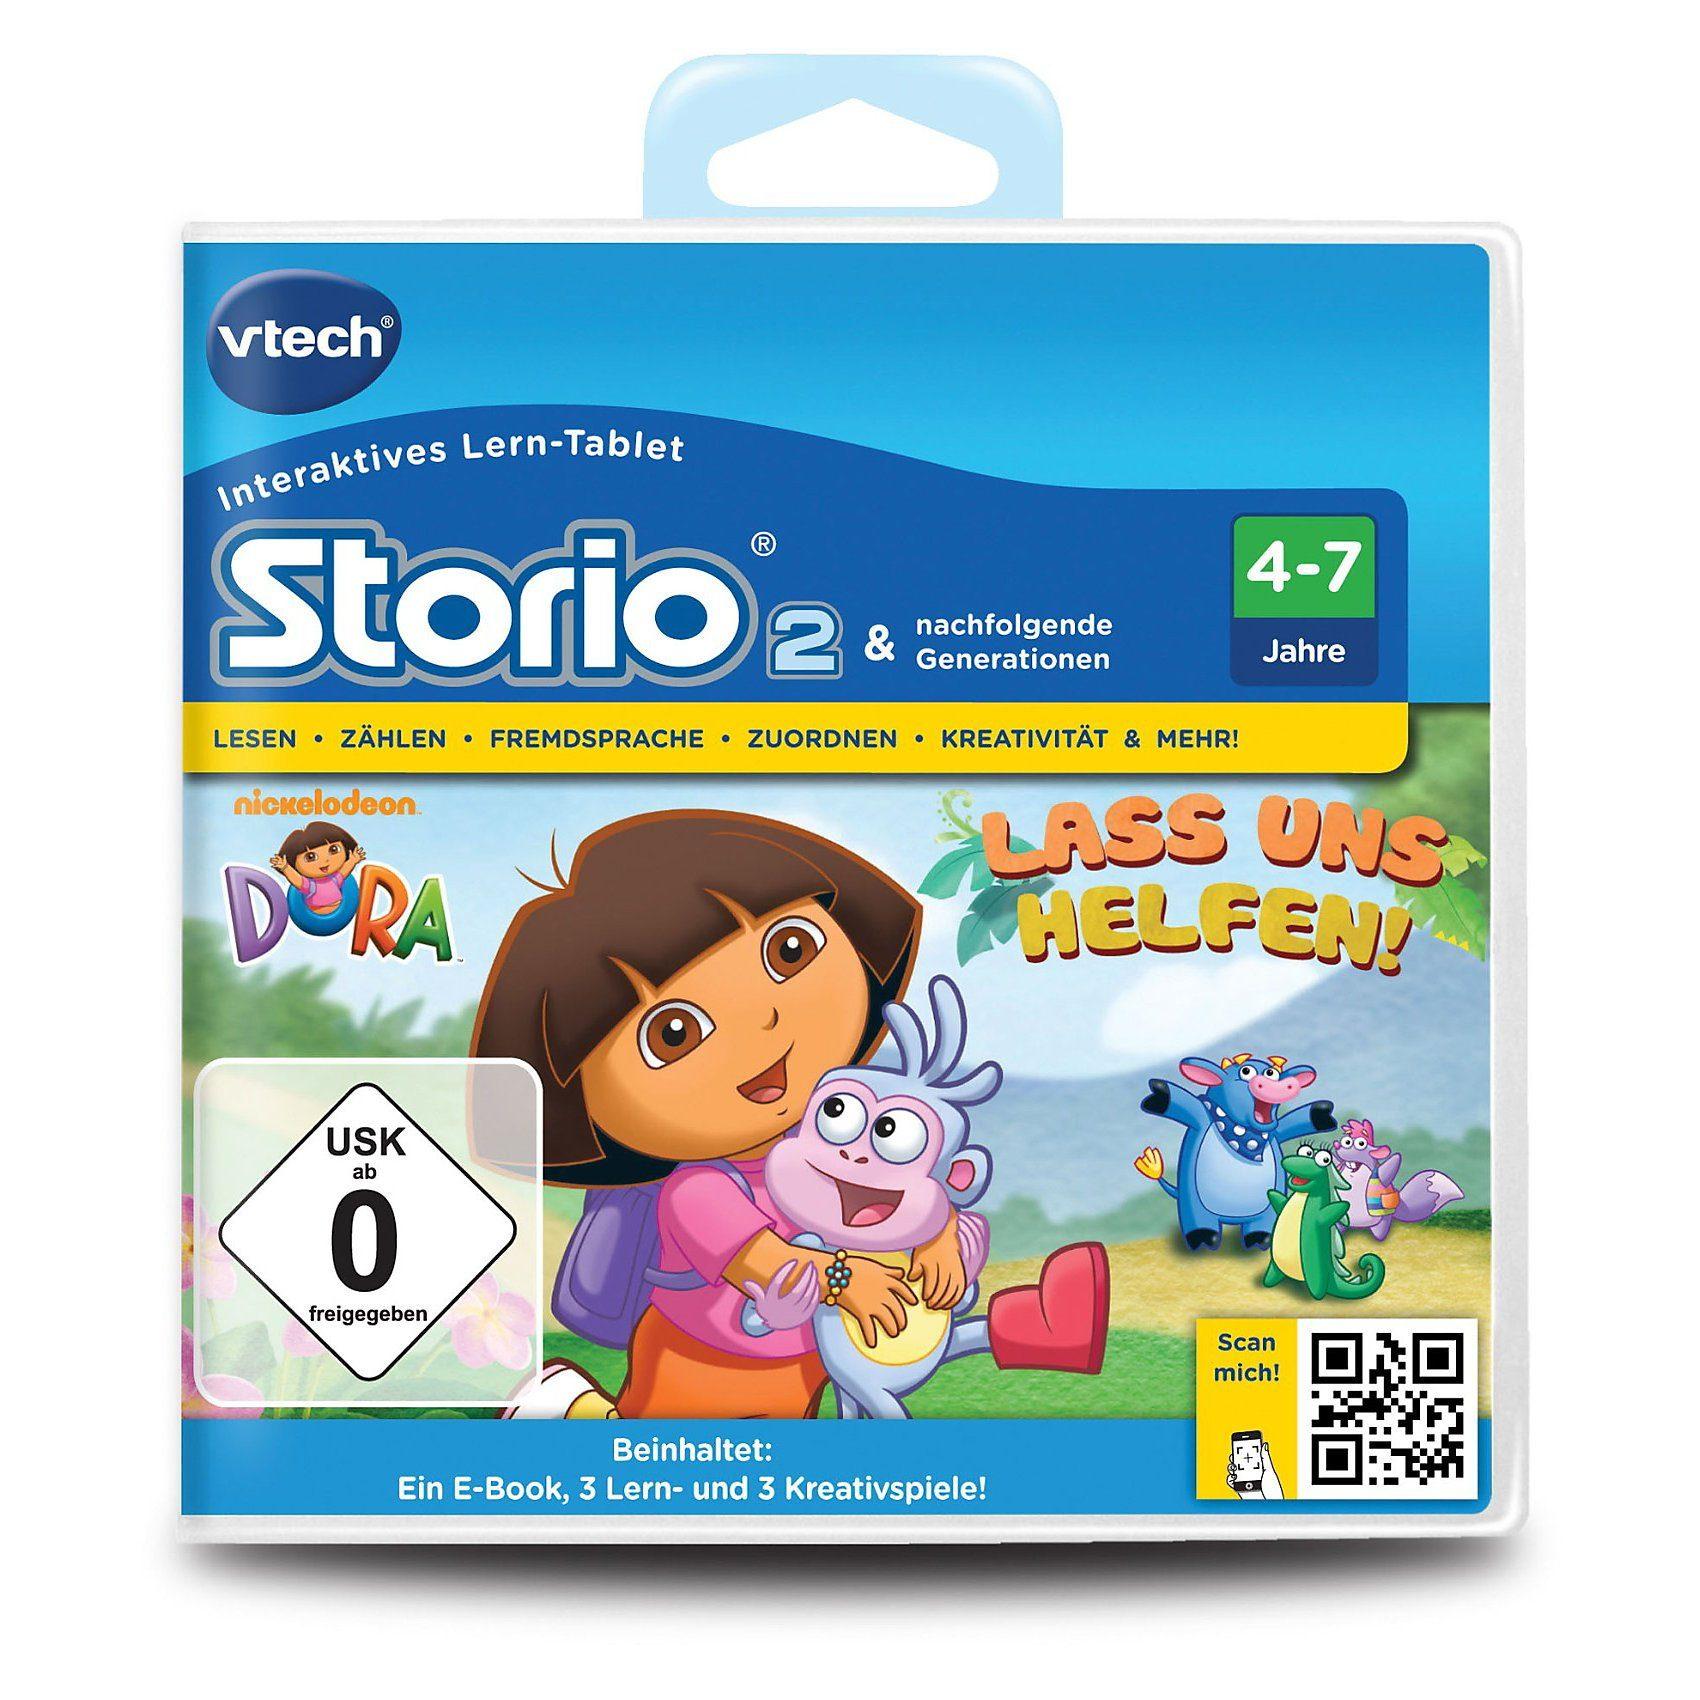 "Vtech Storio 2, 3 & Max Lernspiel ""Dora"""